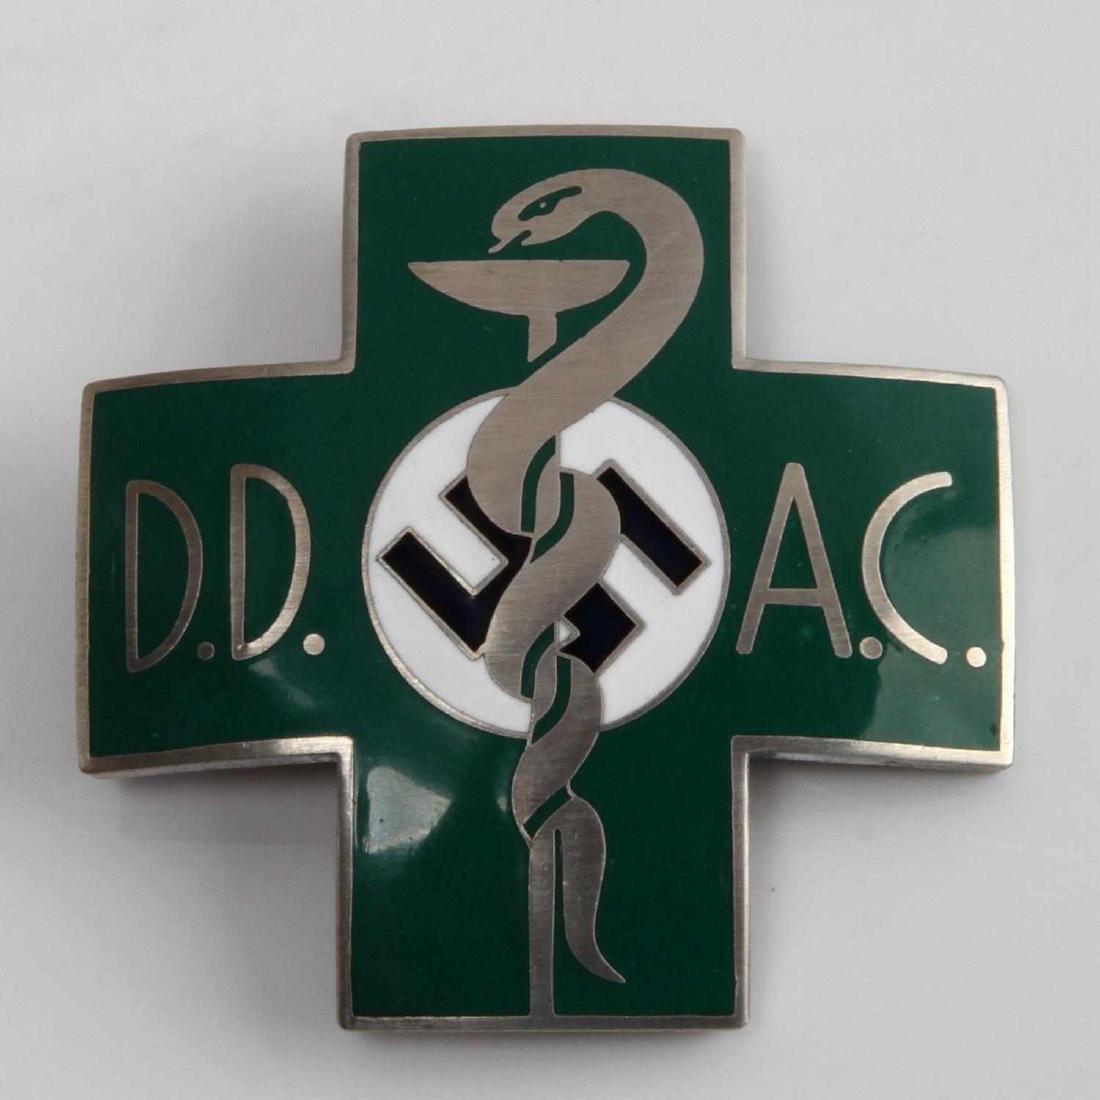 WWII GERMAN THIRD REICH MEDICAL DOCTOR BADGE